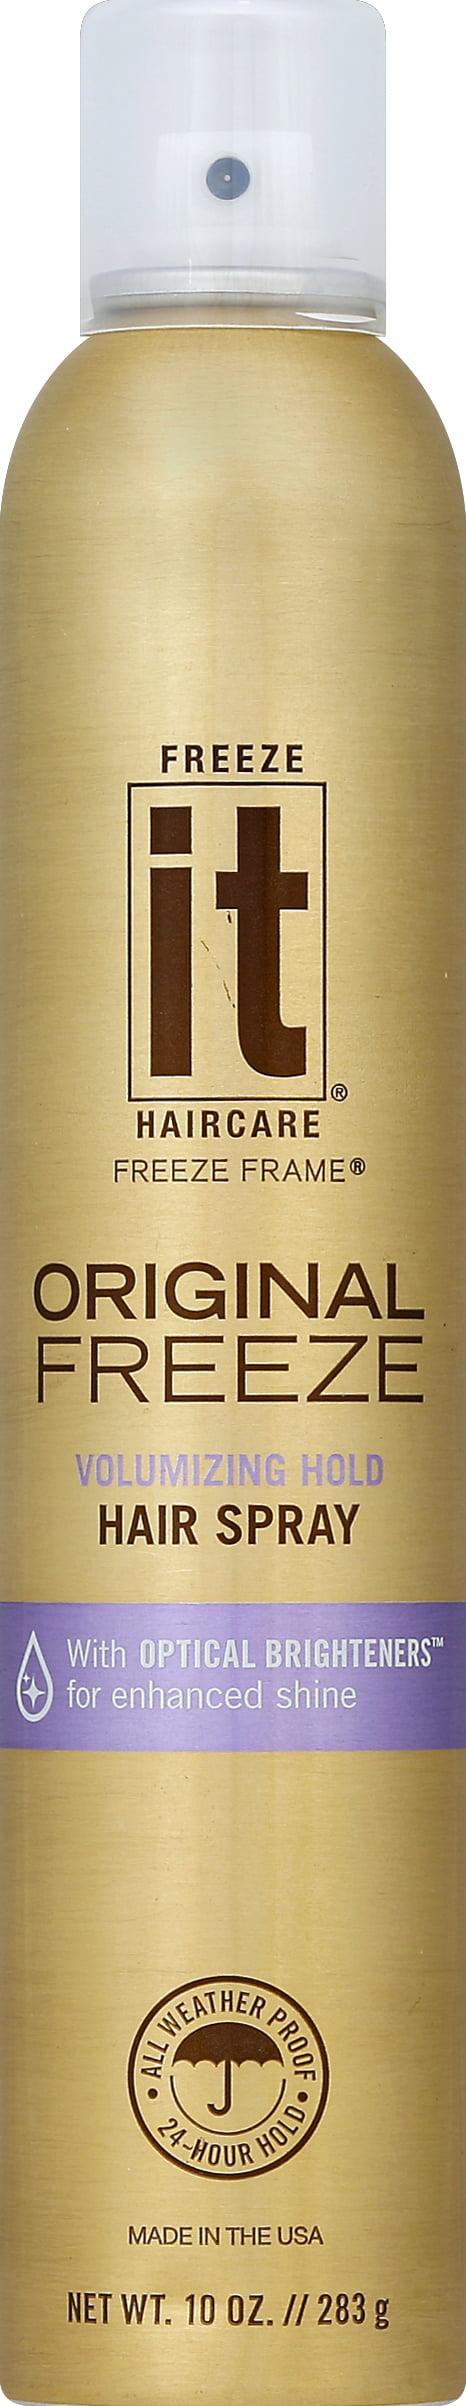 Freeze It Freeze Frame Hair Spray, Original Freeze, 10 0 Ounce